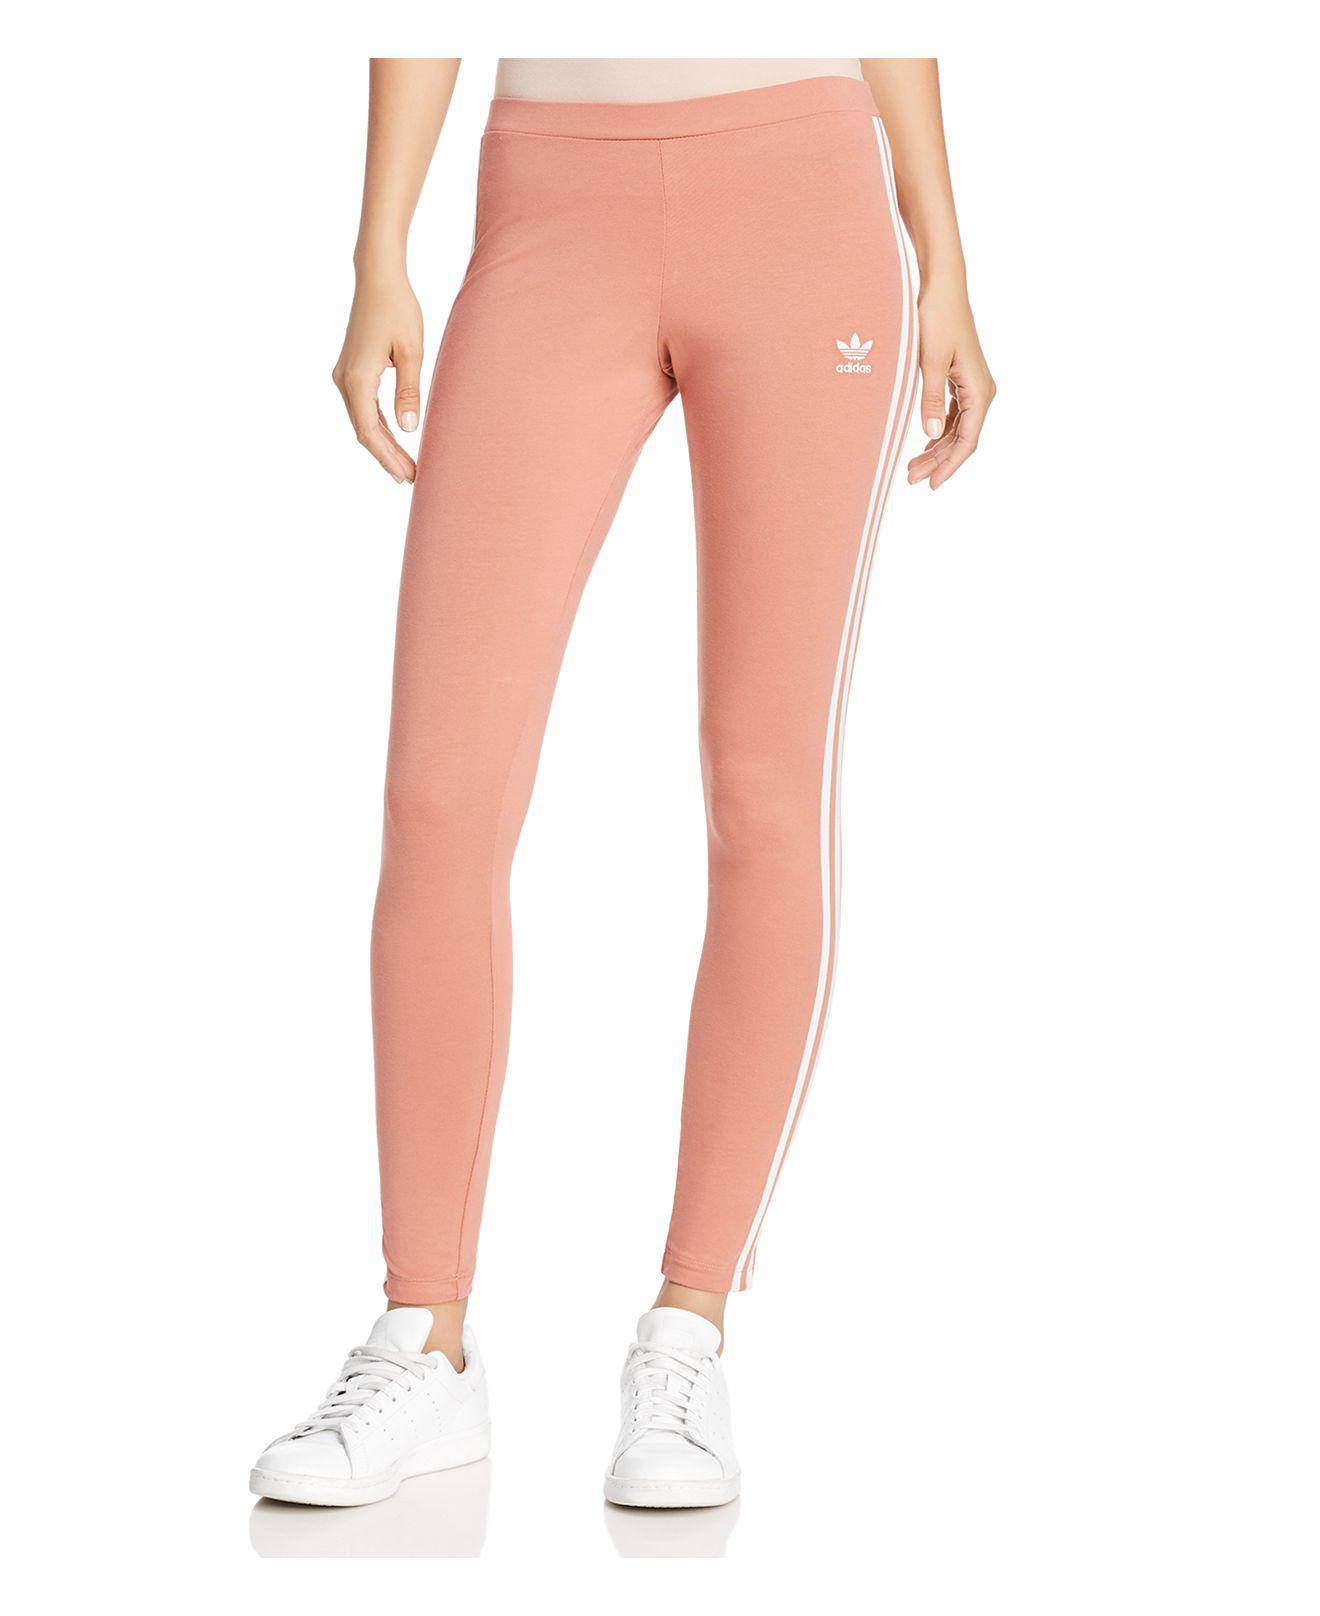 Adidas Originals tres Stripe leggings en color rosa Lyst